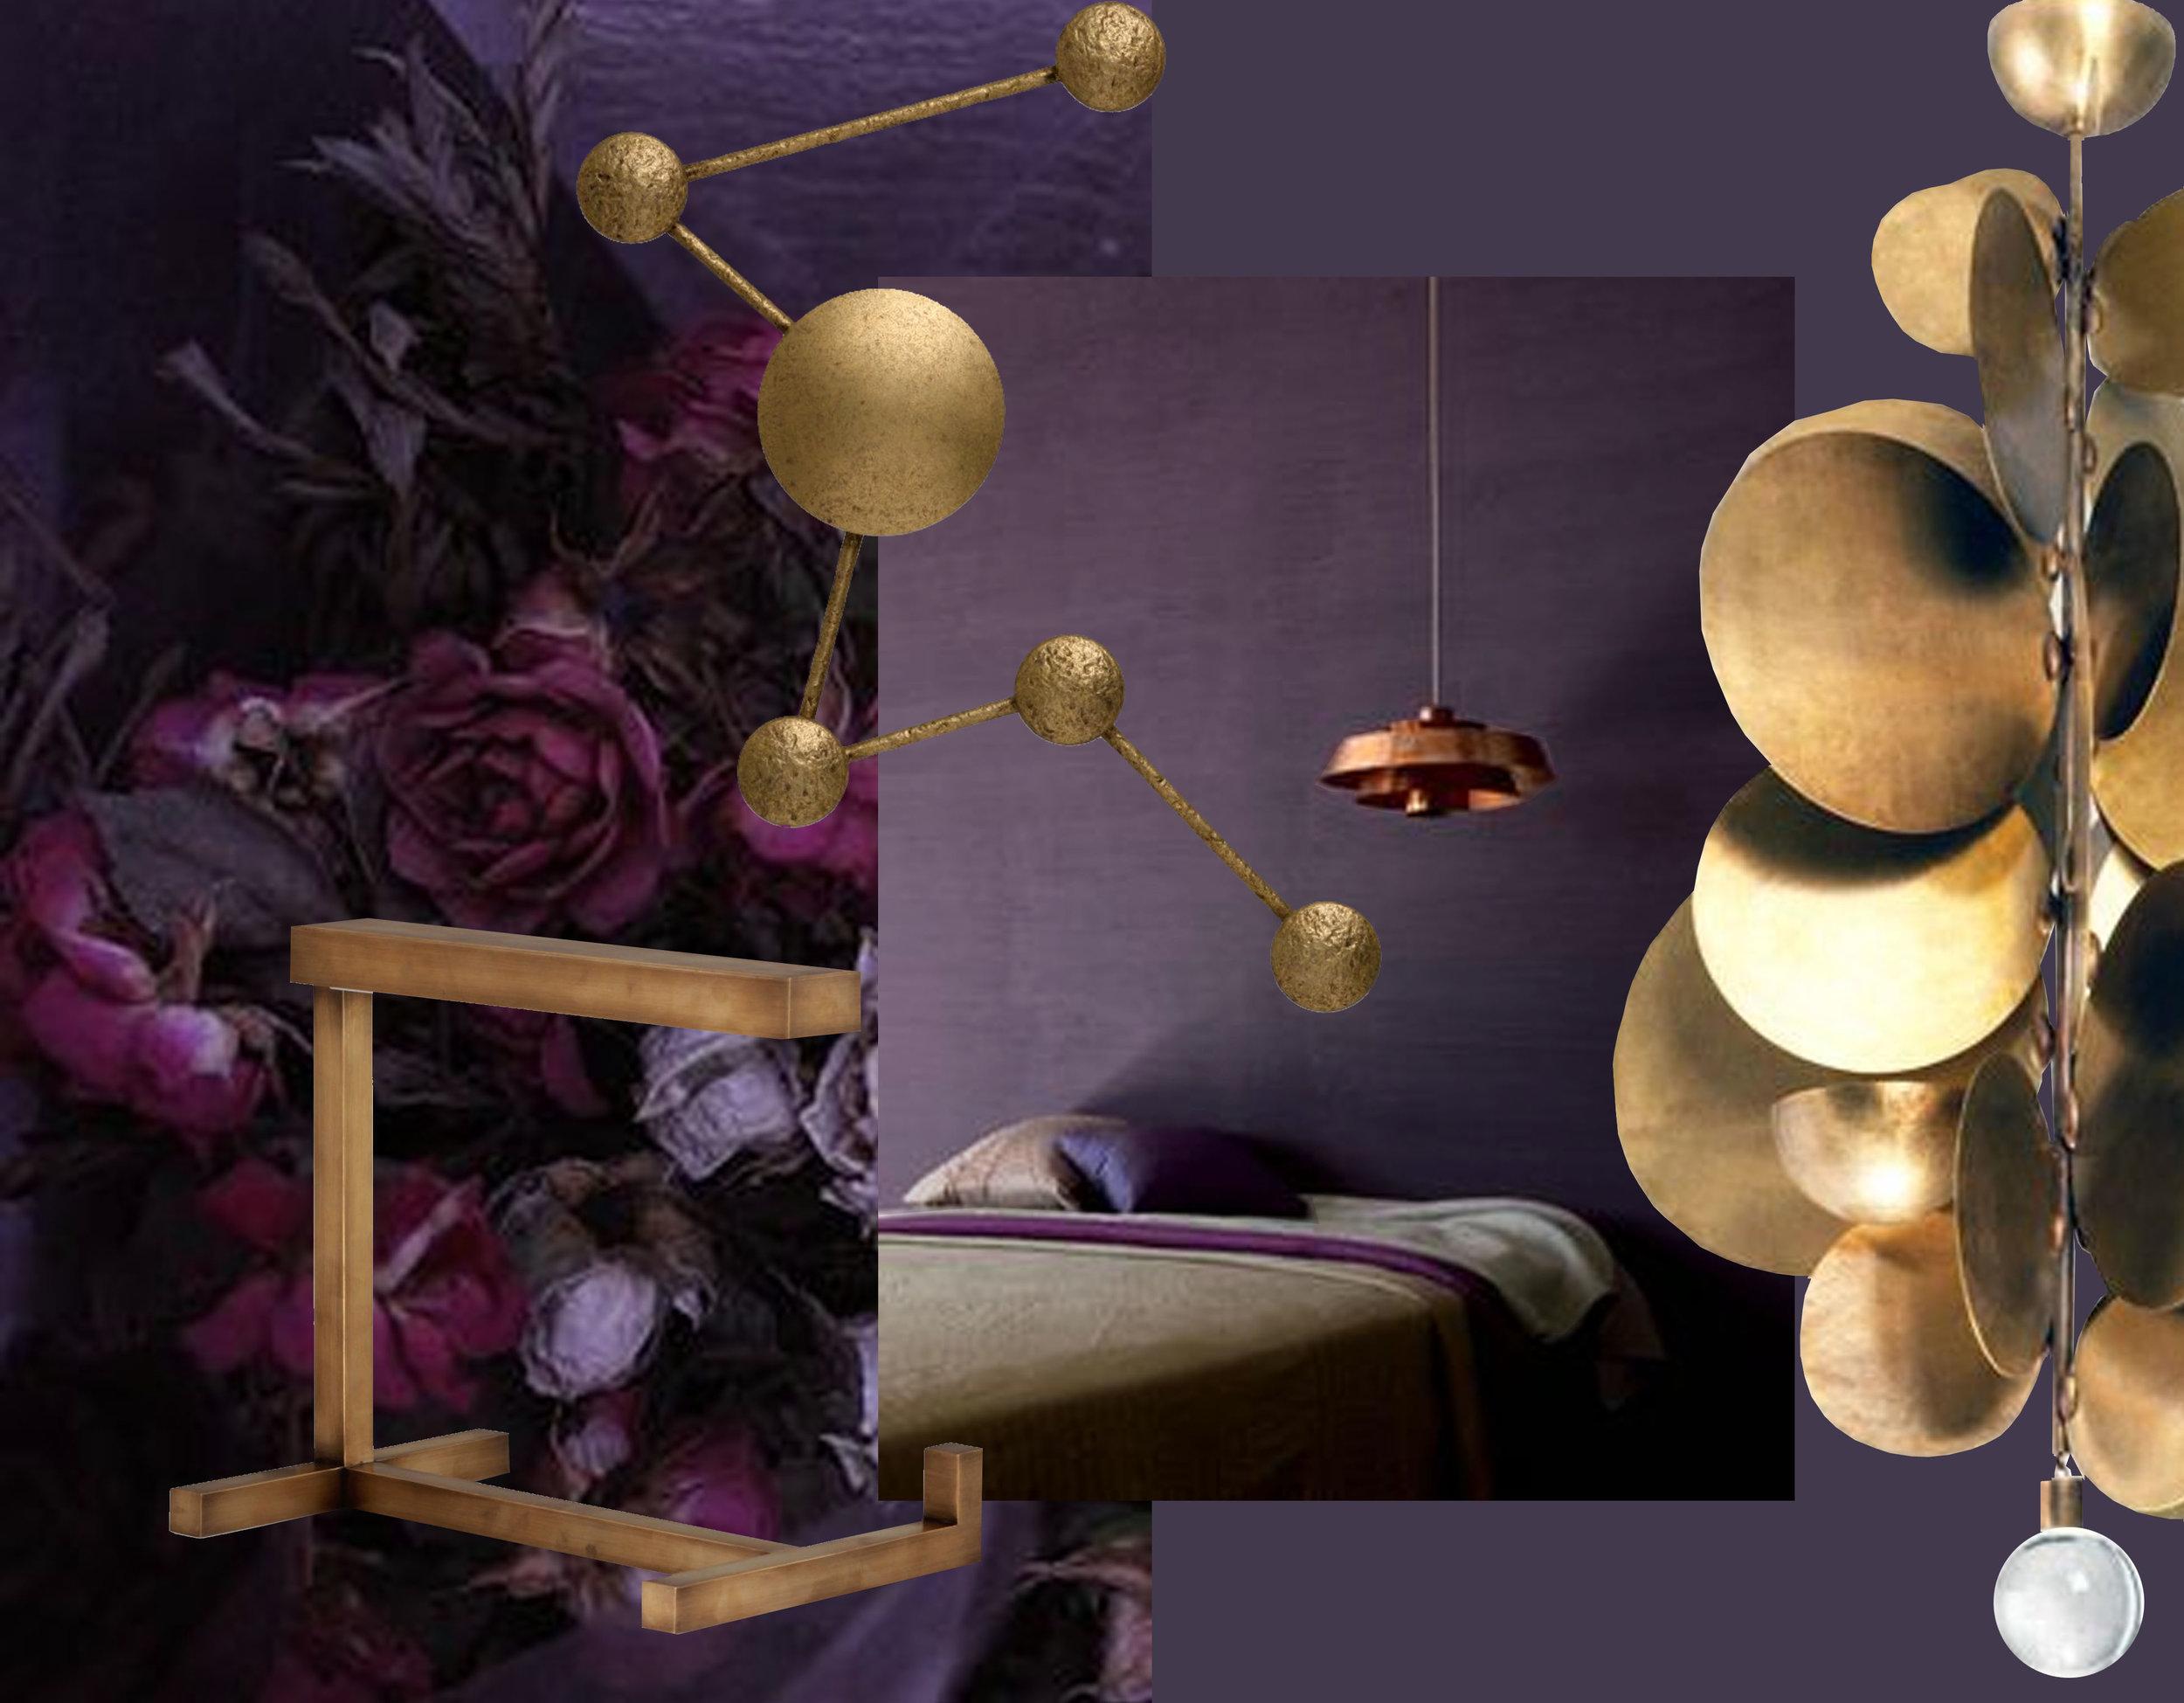 flowers via  Wish  - bedroom image via  Fresh Home  - Horizon desk lamp  Porta Romana  - wall lamp Constellation  Porta Romana  - Pastille hanging lamp Herve Van der Straeten via  Veranda